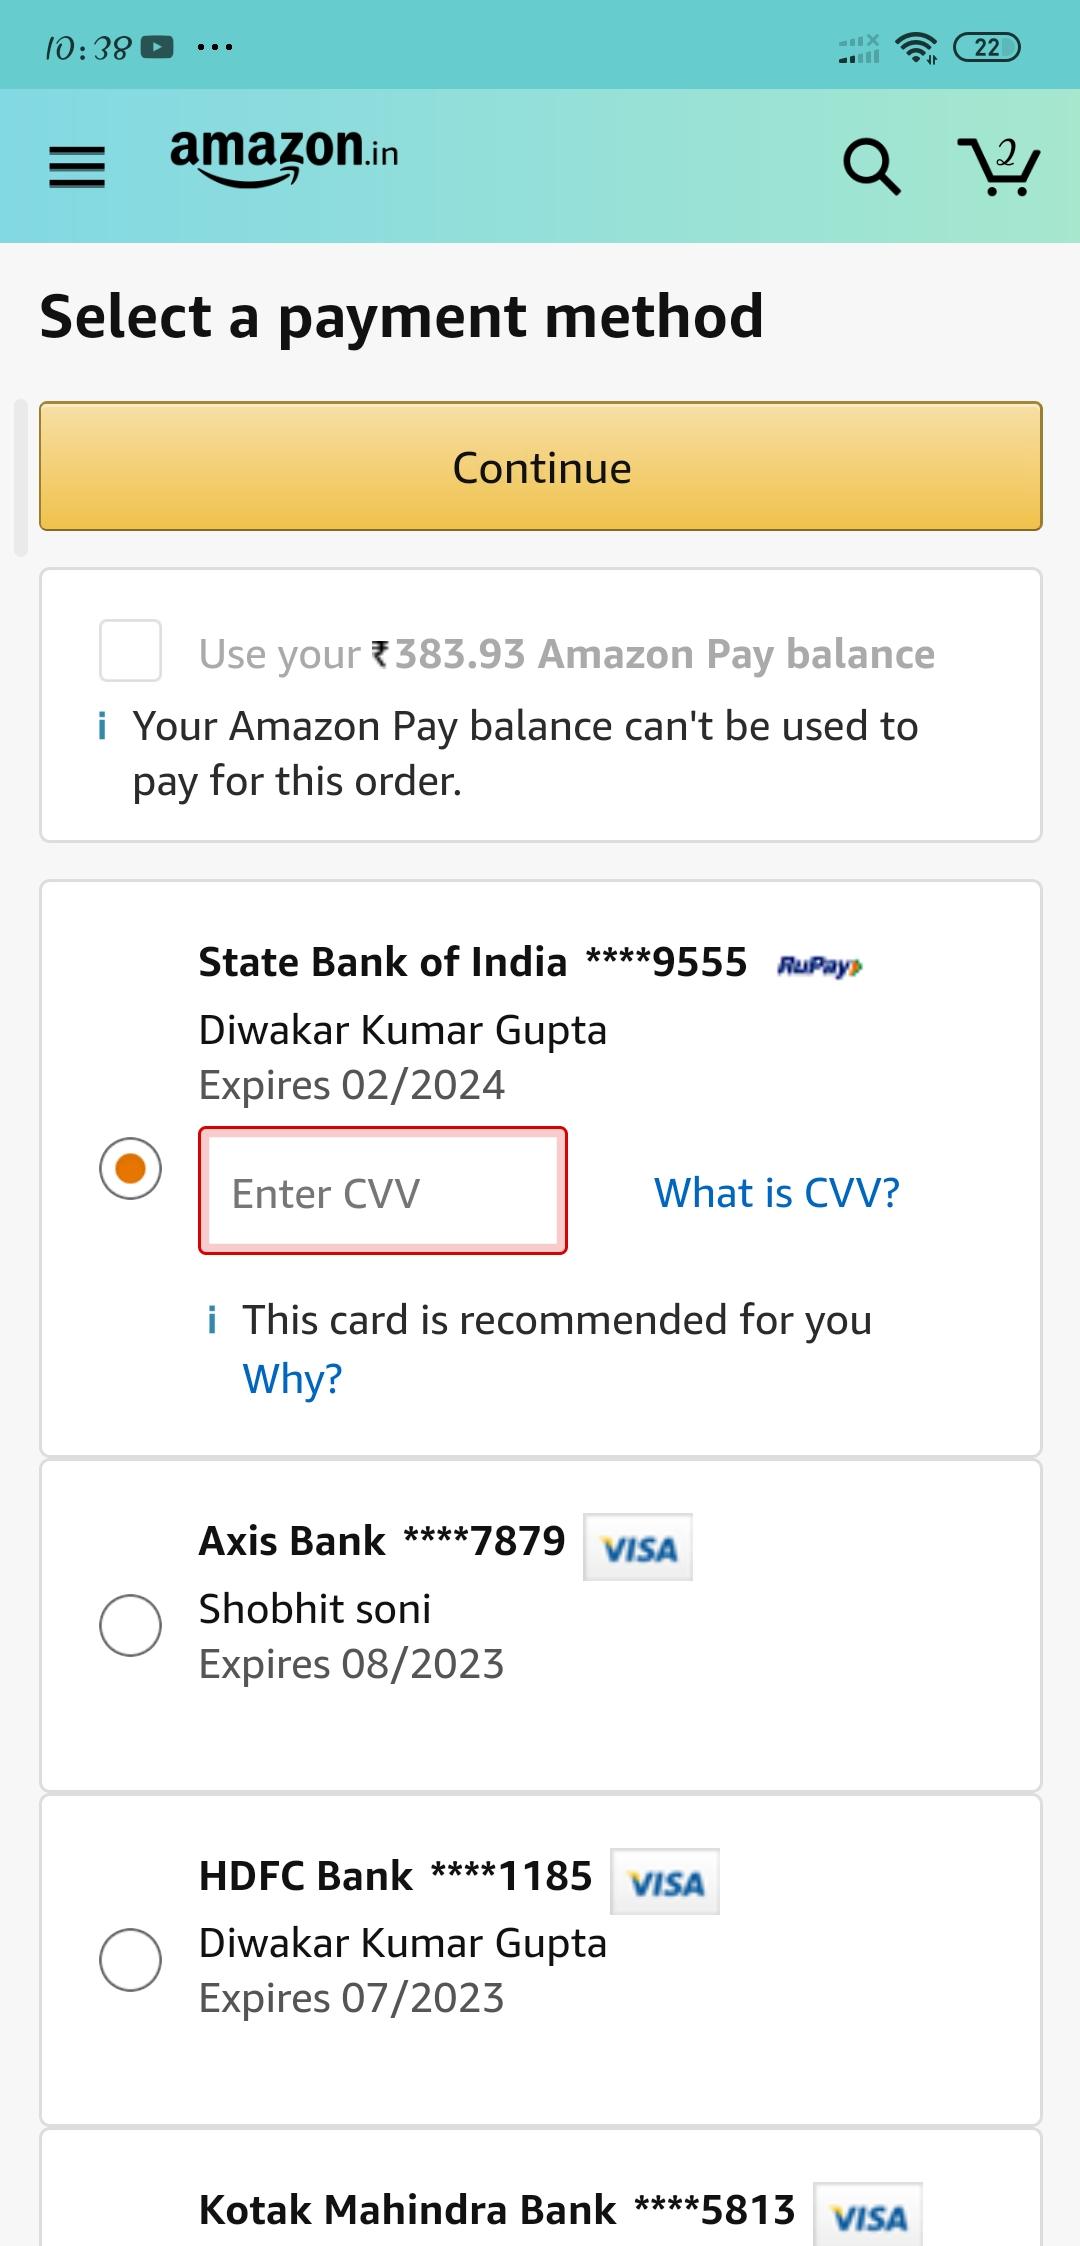 https://cdn0.desidime.com/attachments/photos/594372/original/Screenshot_2019-11-10-10-38-21-851_in.amazon.mShop.android.shopping.jpg?1573362524